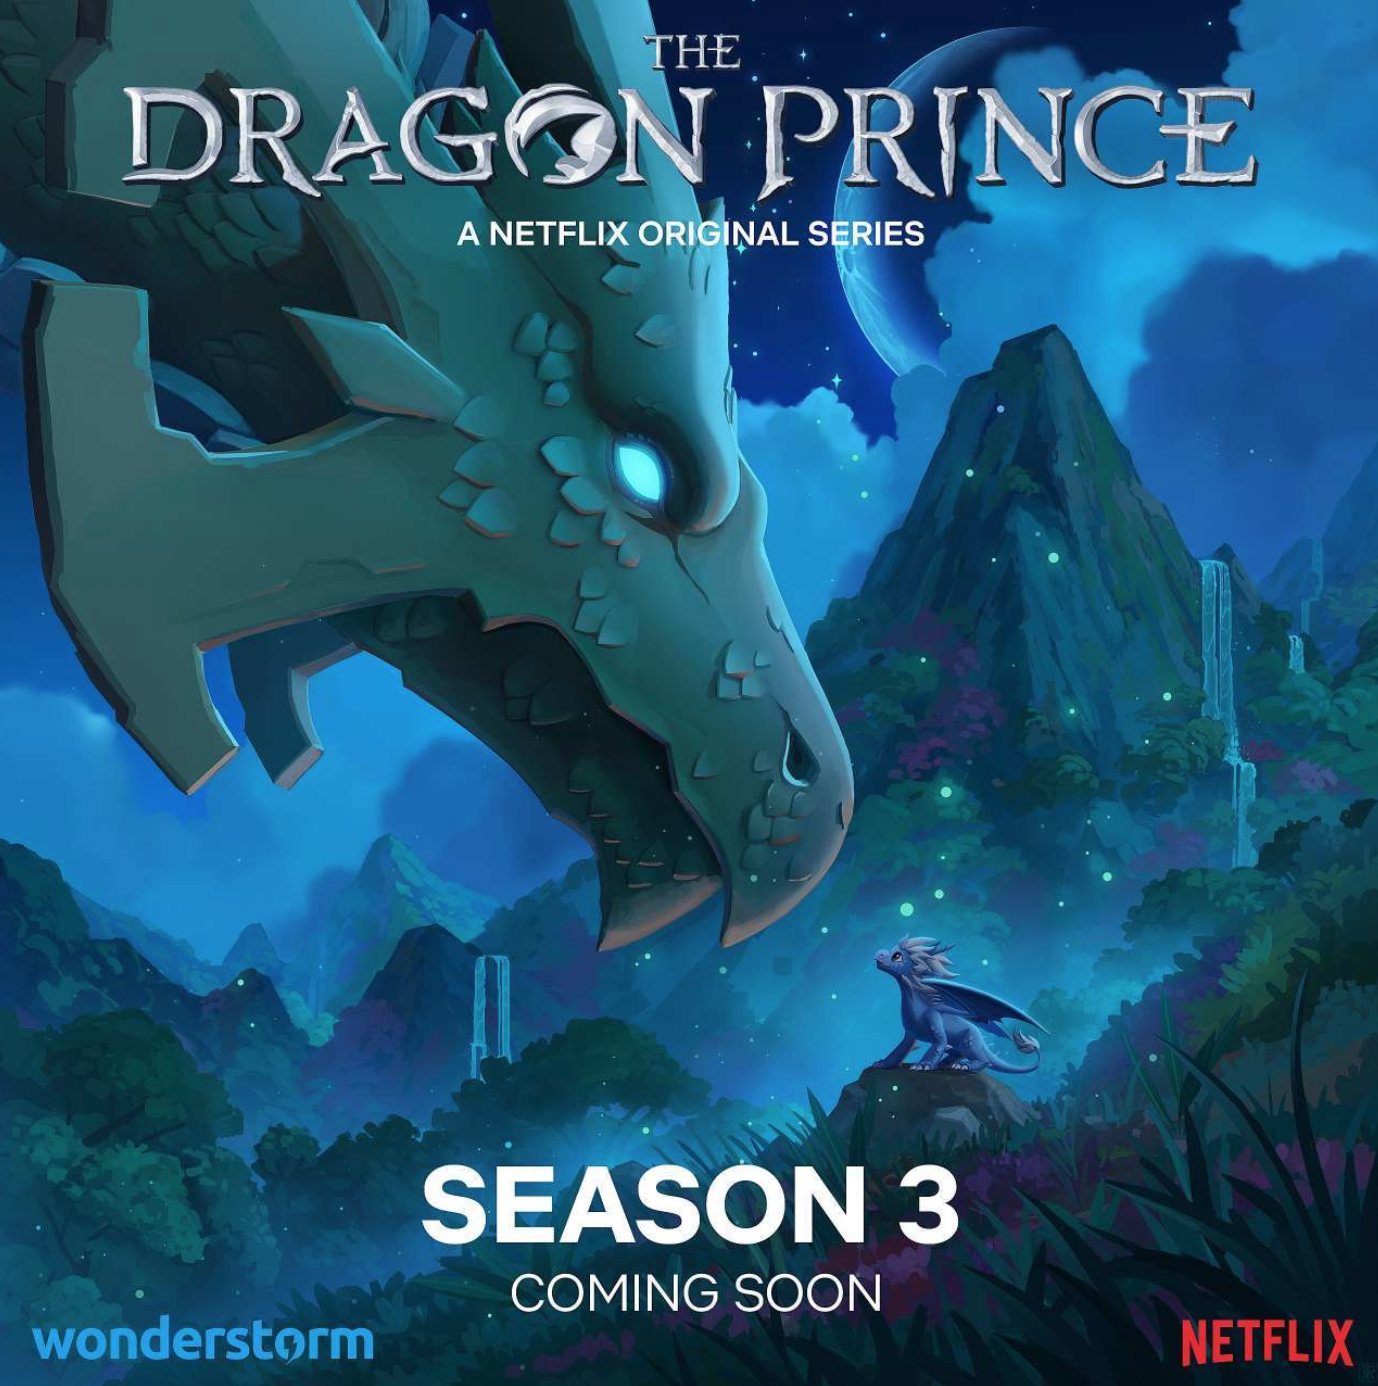 The Dragon Prince Netflix seizoen 3